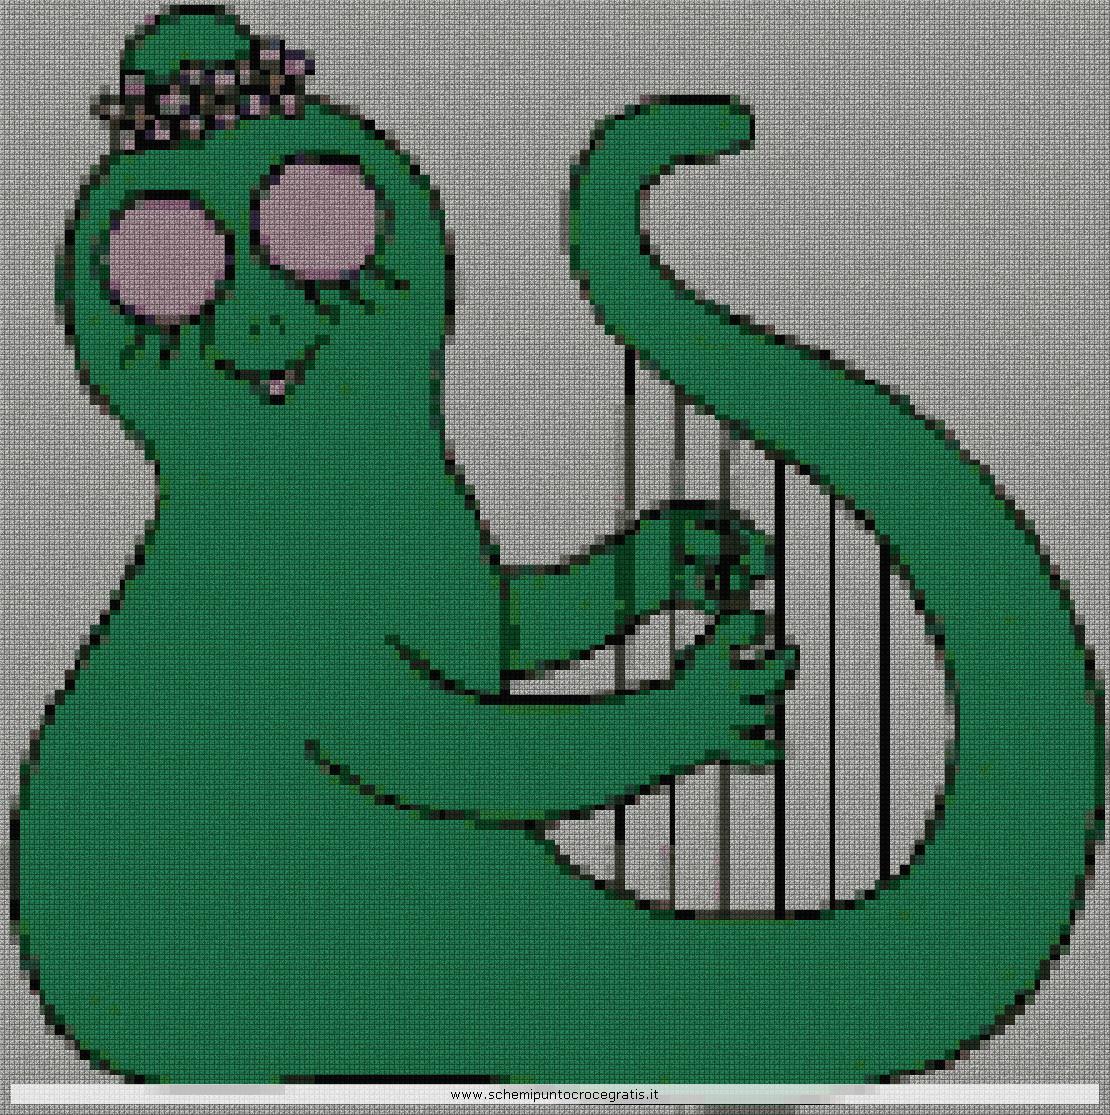 schemi_misti/cartoni_animati/lala_harpe_s.JPG